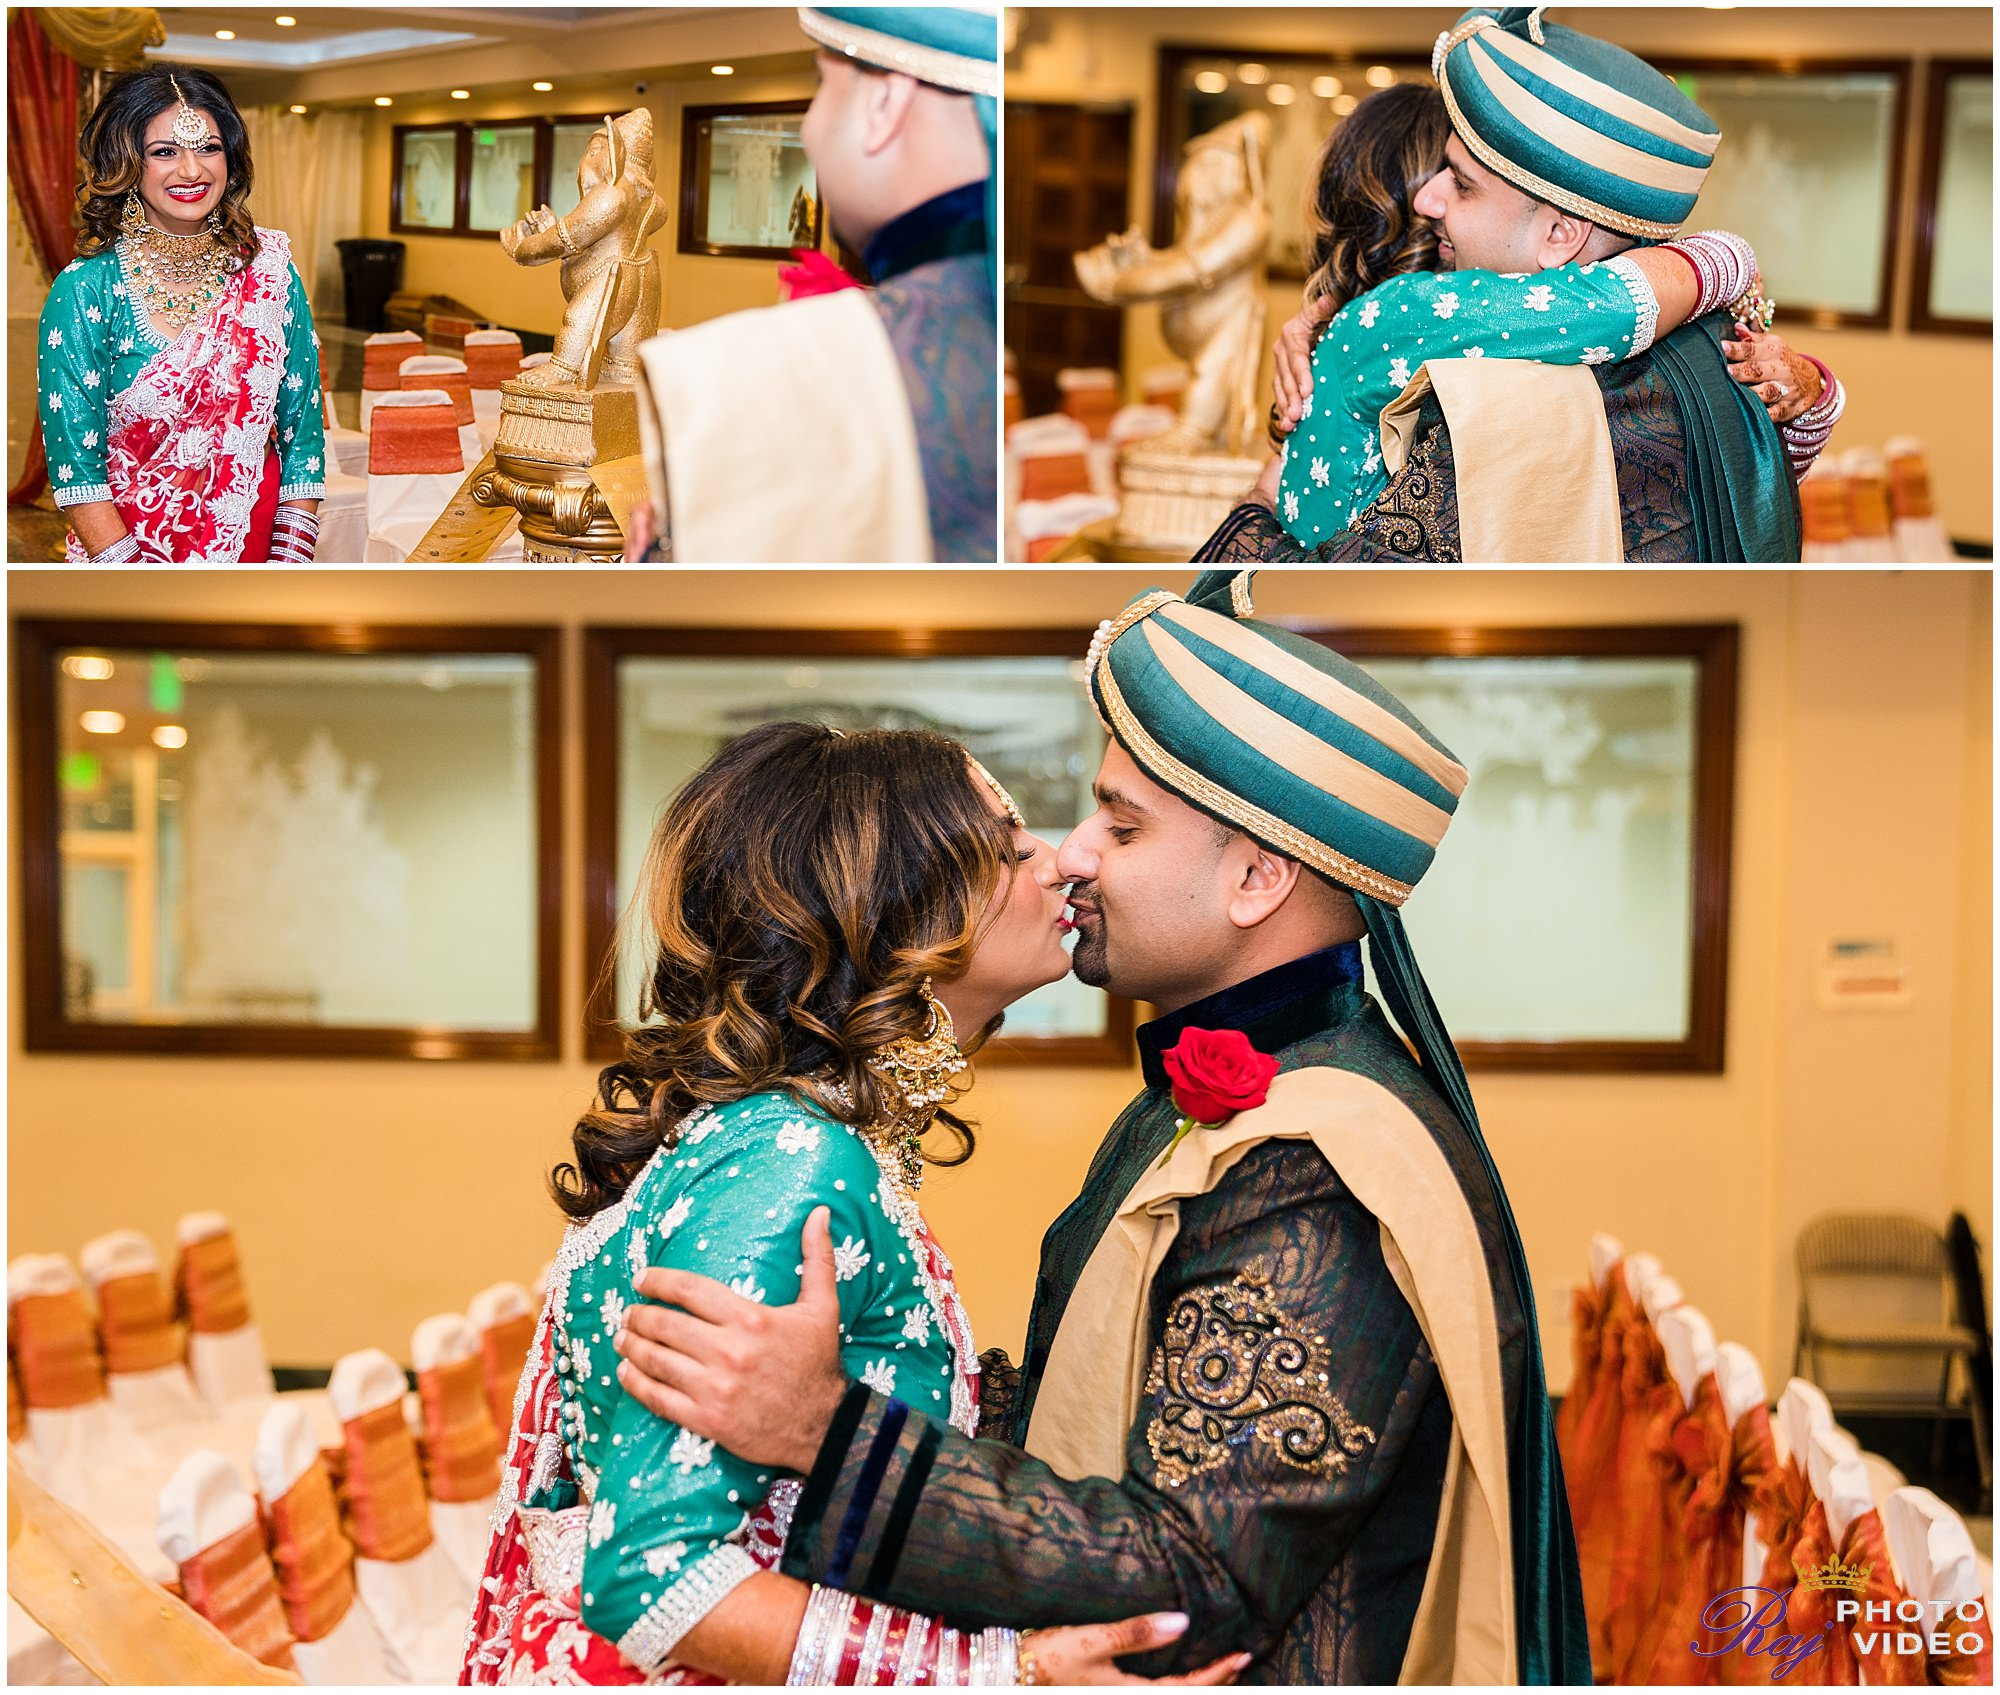 Sri-Guruvaayoorappan-Temple-Marlboro-NJ-Indian-Wedding-Chiyomi-Scott-00006.jpg